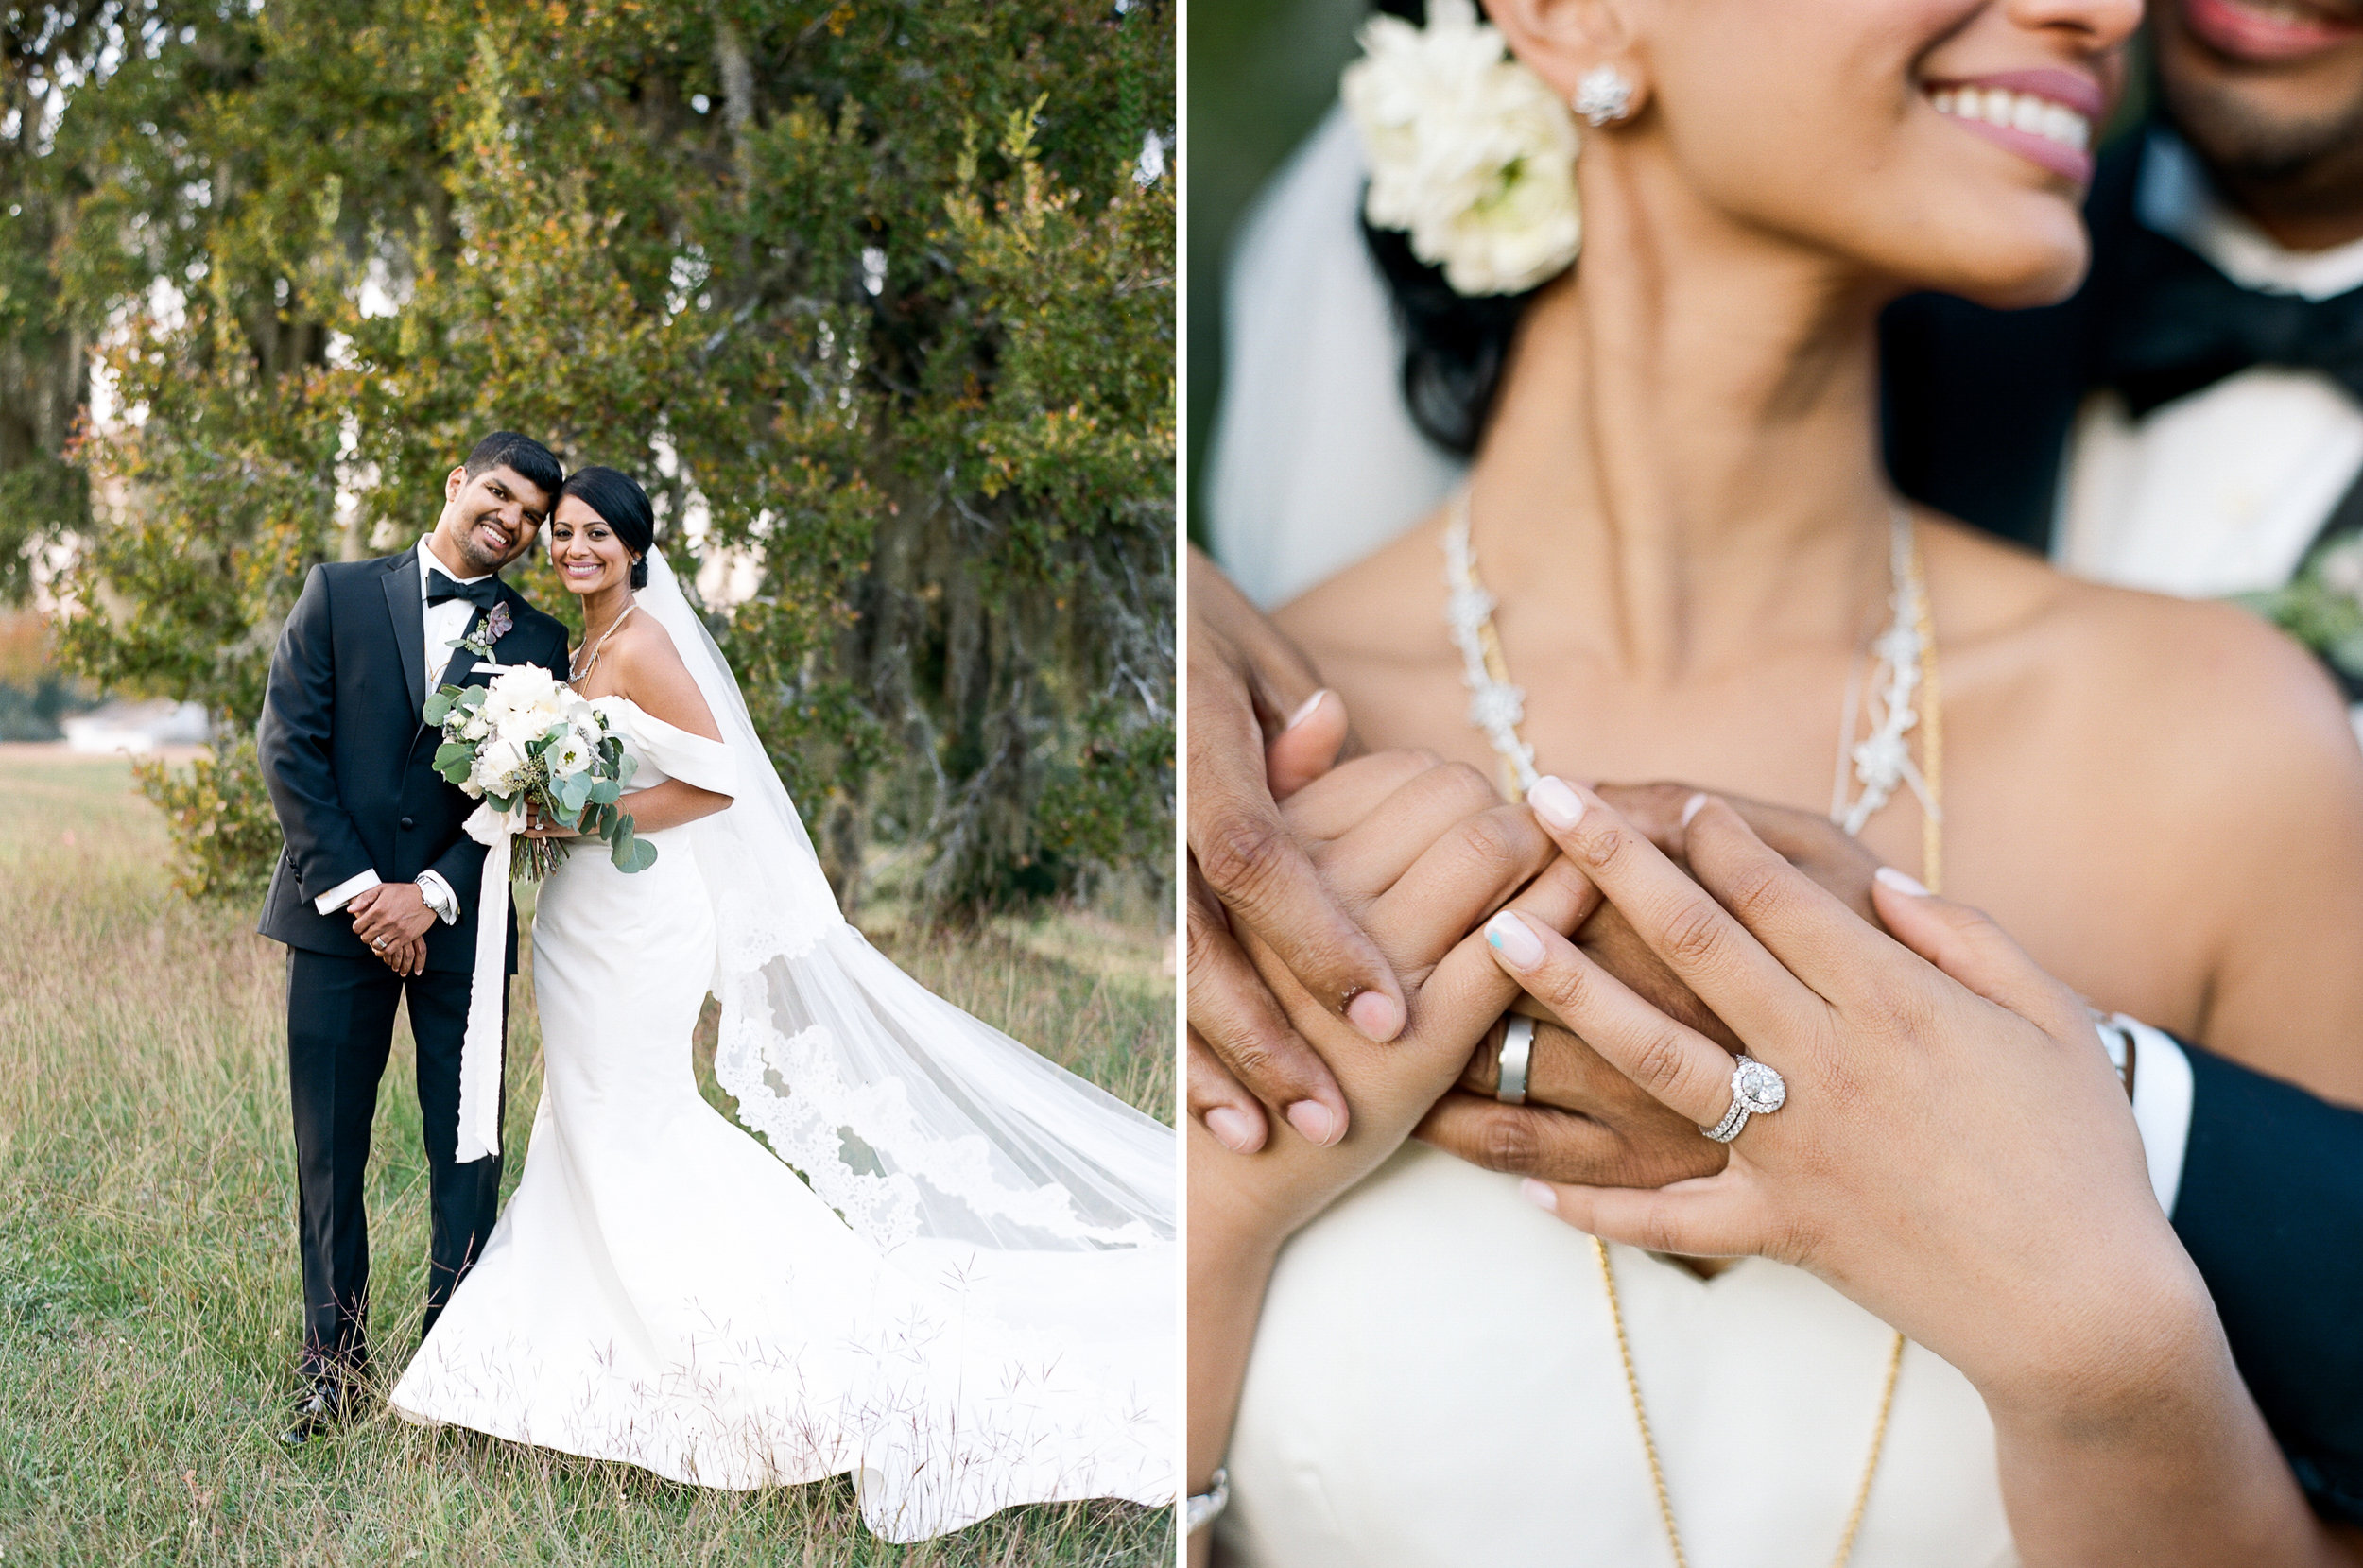 Fine-Art-Film-Houston-Wedding-Photographer-Best-Top-Luxury-Texas-Austin-Dallas-Destination-Dana-Fernandez-Photography-The-Bell-Tower-on-34th-Indian-9-111.jpg